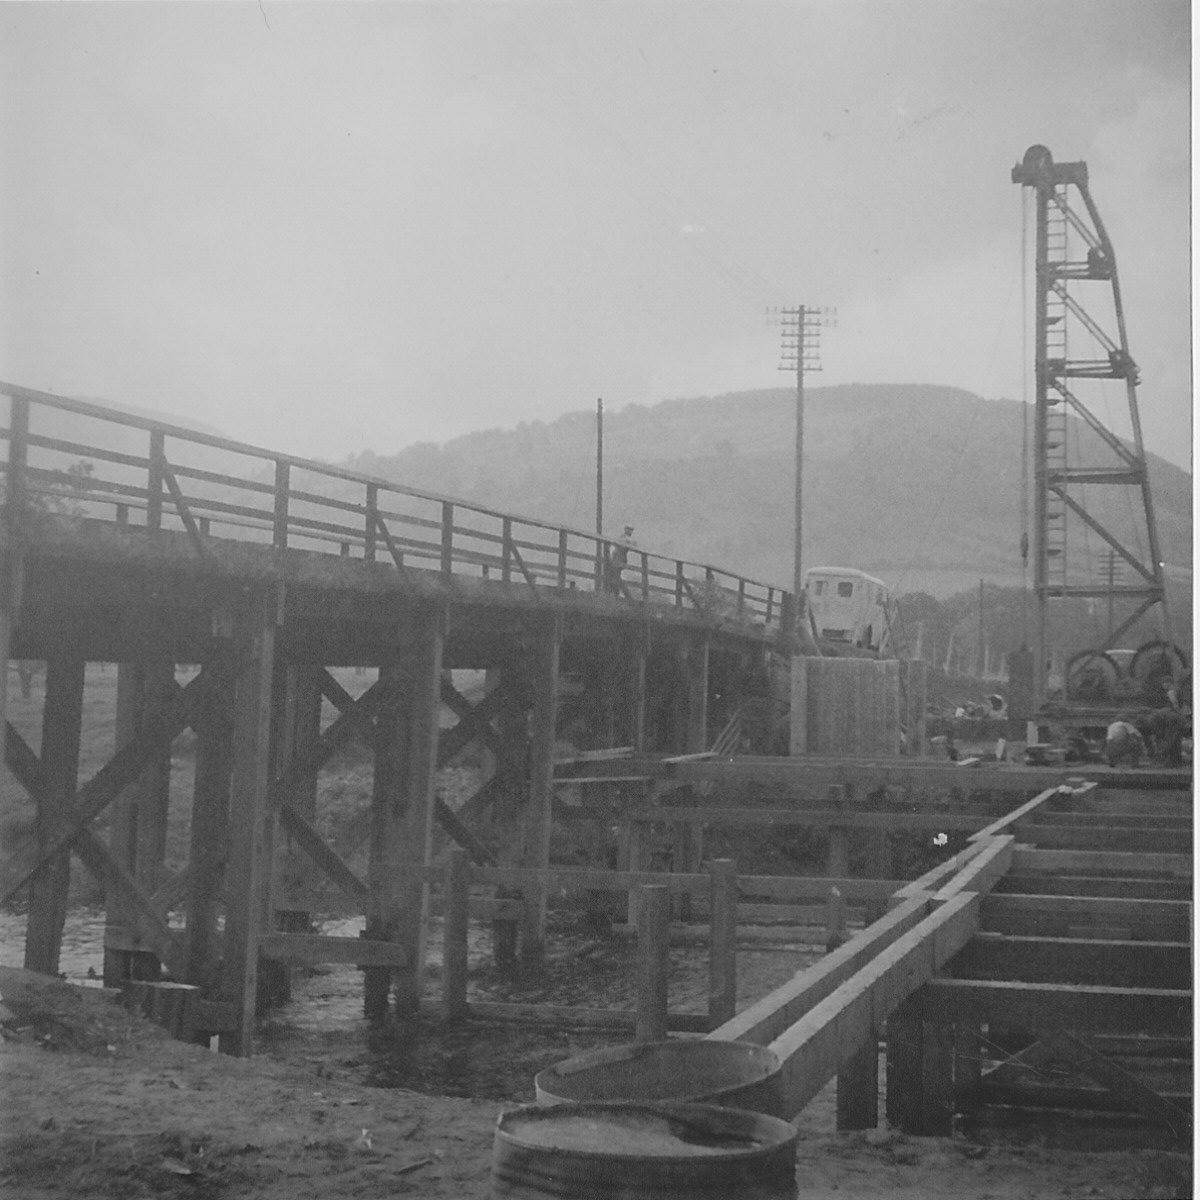 Rebuiling the Usk railway bridge